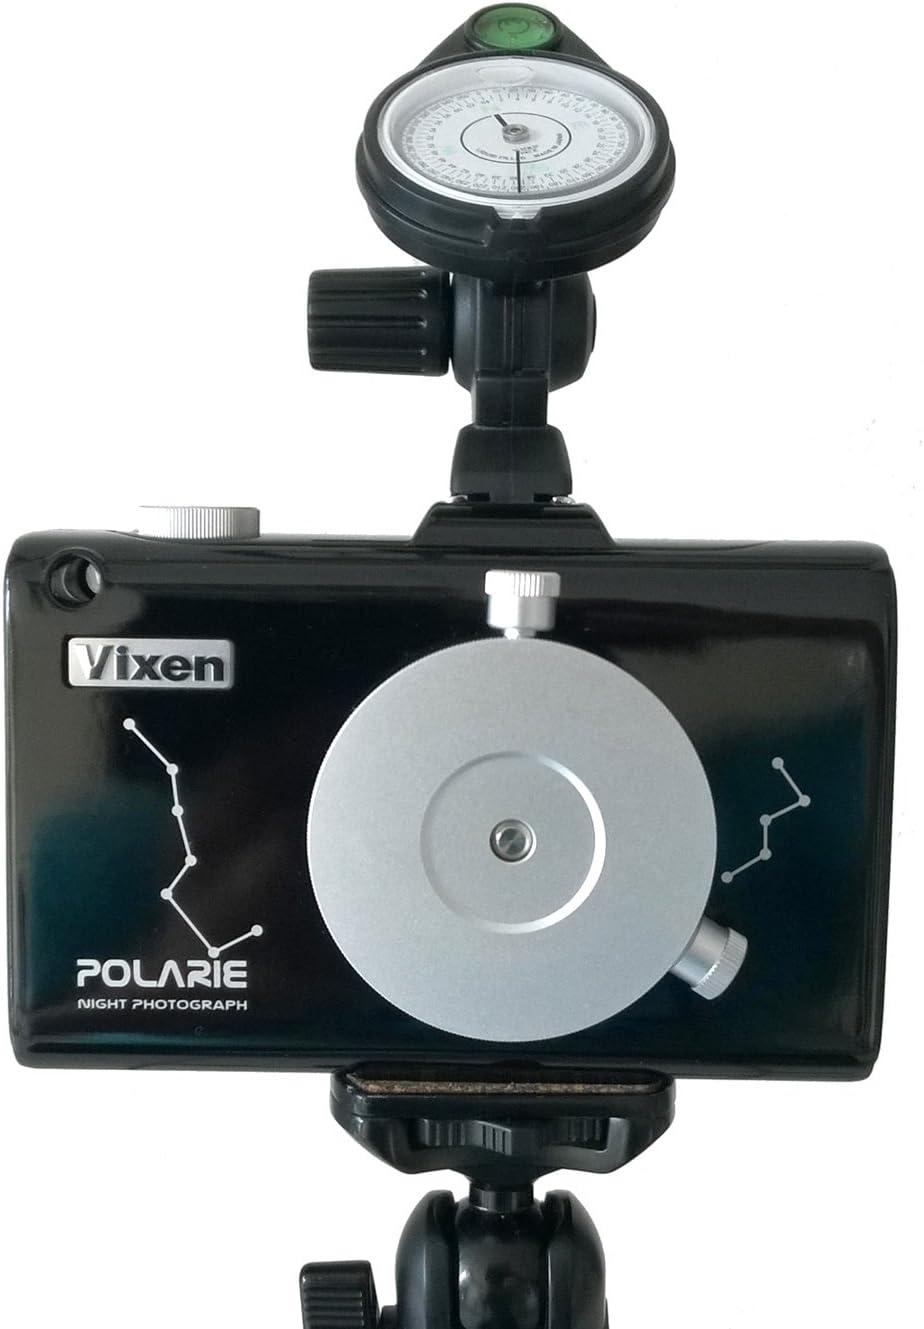 Vixen Polarie Star Tracker With Polar Meter Limited Camera Photo